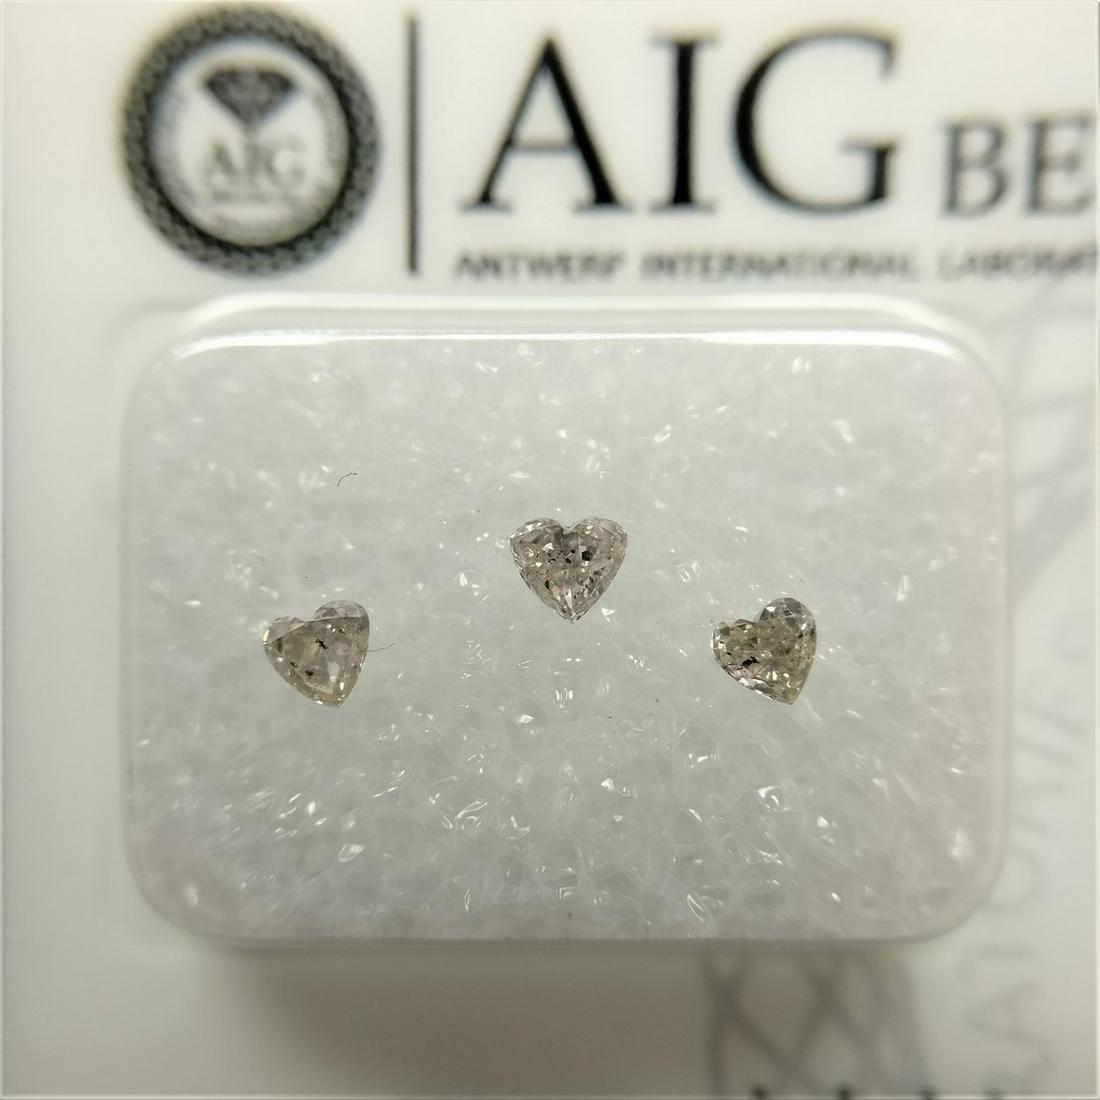 0.27 ct Heart cut Diamonds Light Orangy Pink SI2-I1